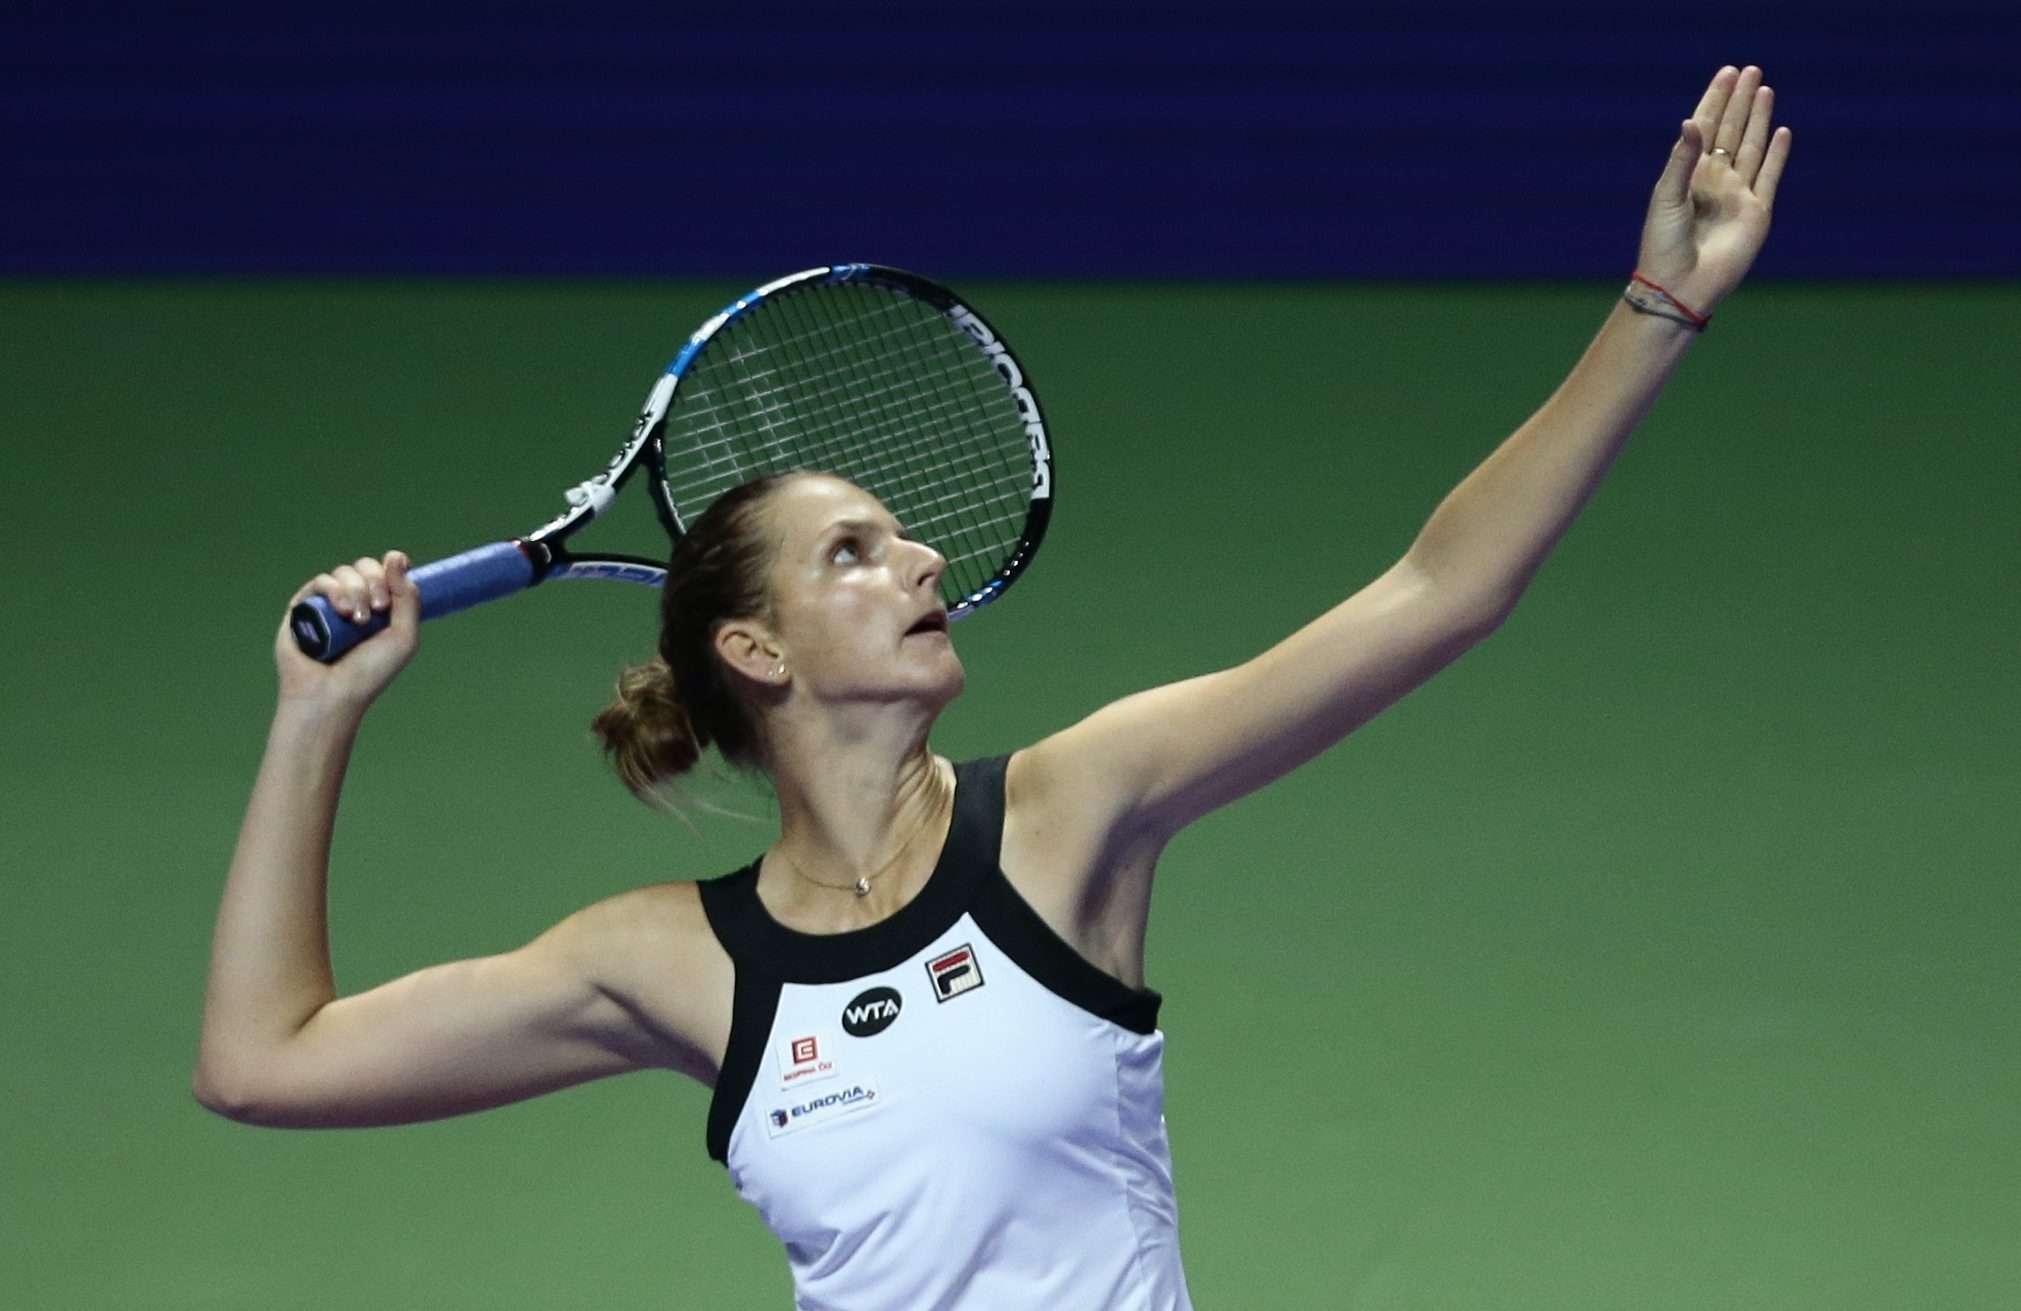 Svetlana Kuznetsova thanks Singapore crowd after beating Karolina